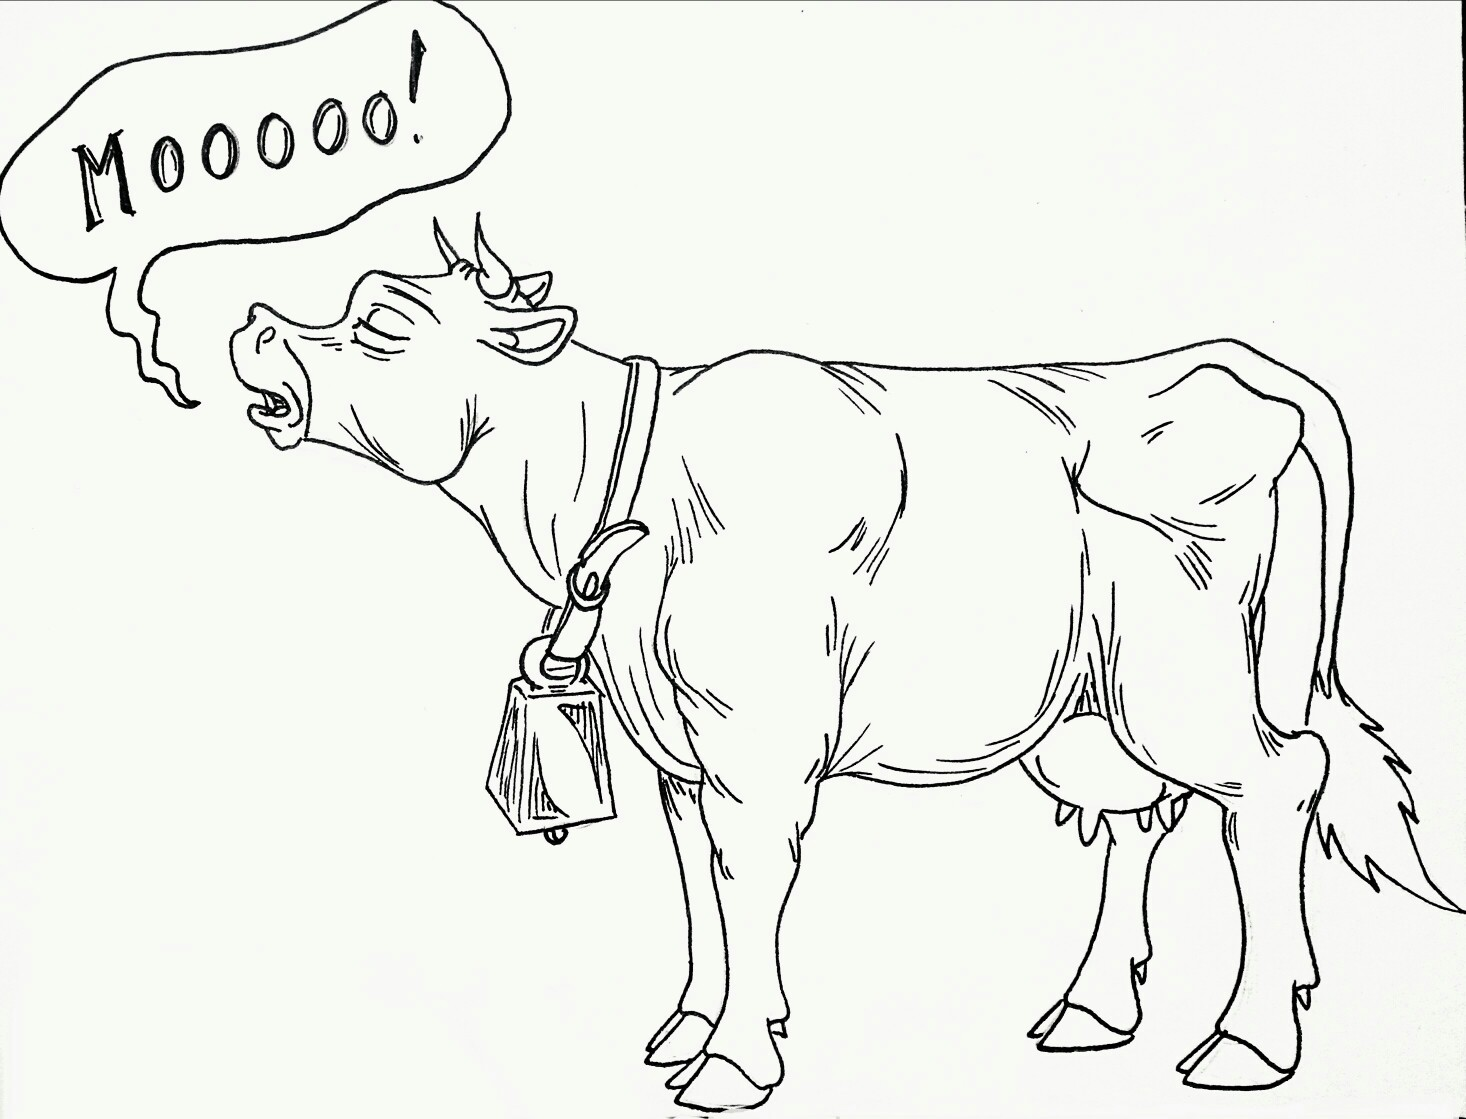 1466x1119 Mooing Cow Line Sketch. By Eric Daniel Muntz, 2017 Cartoon